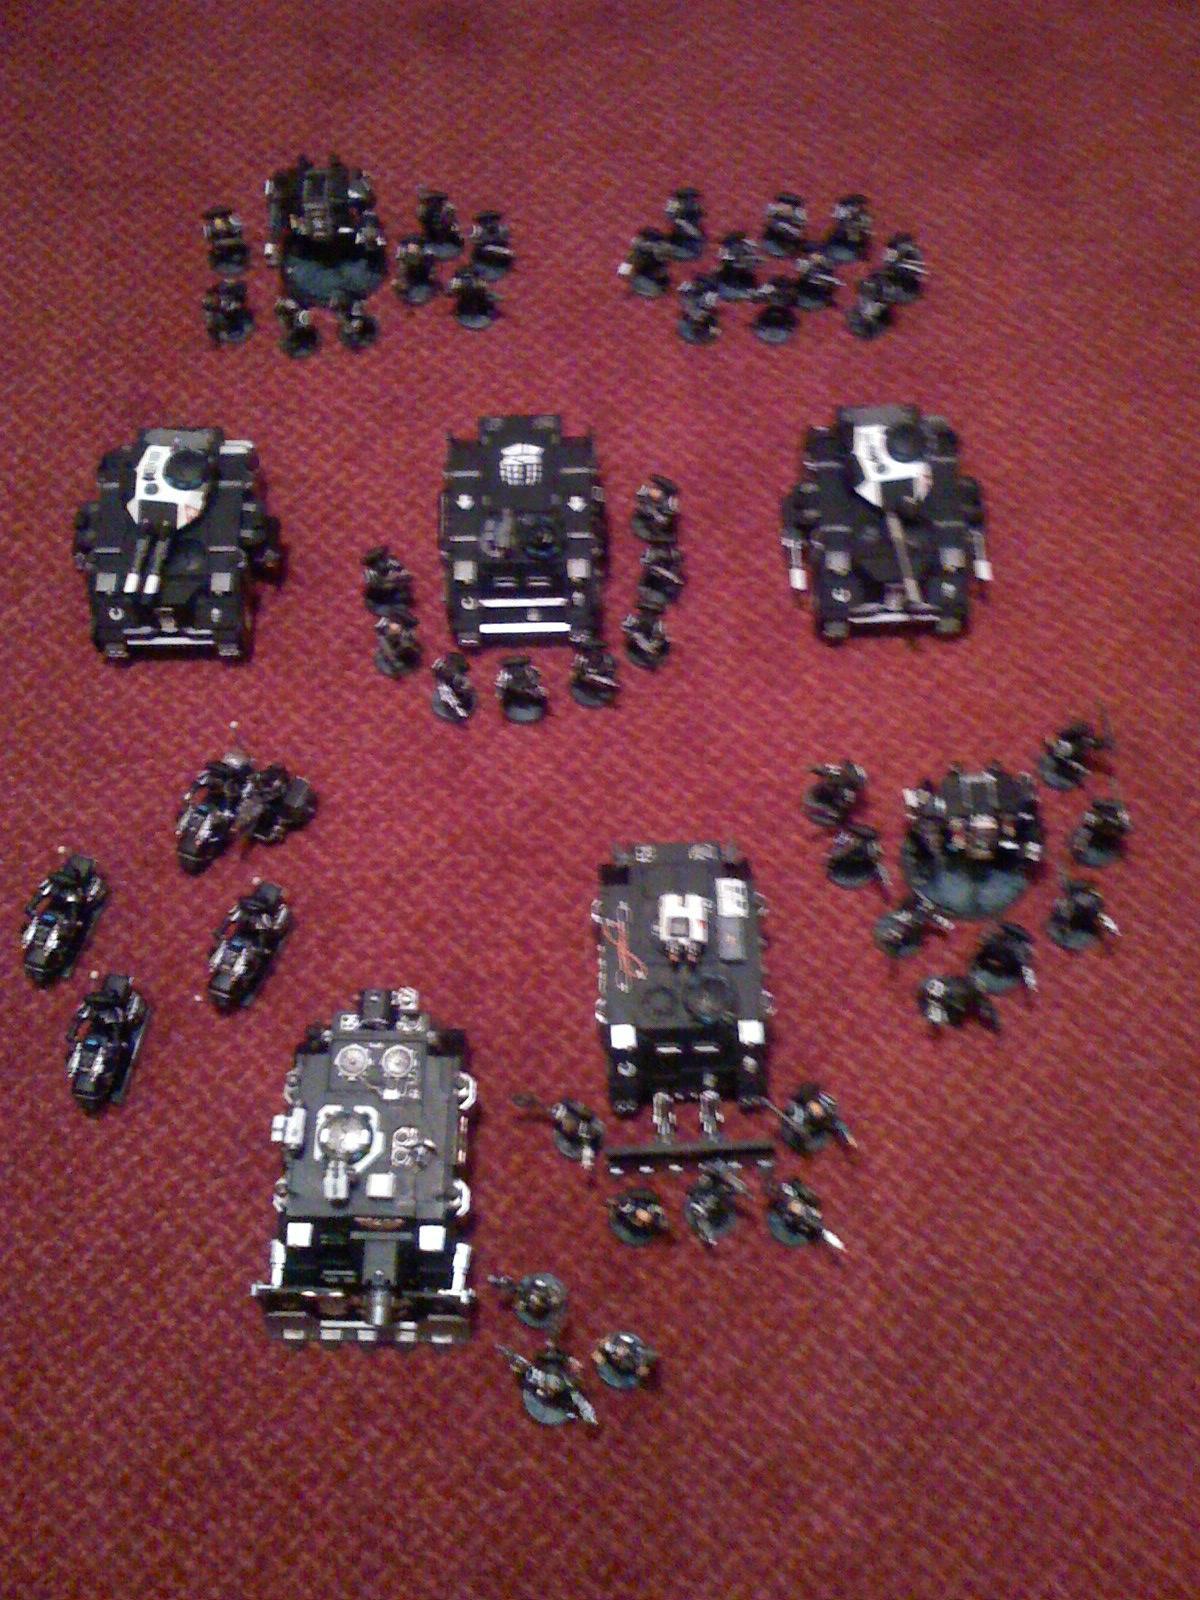 Army, Iron Hands, Space Marines, Warhammer 40,000